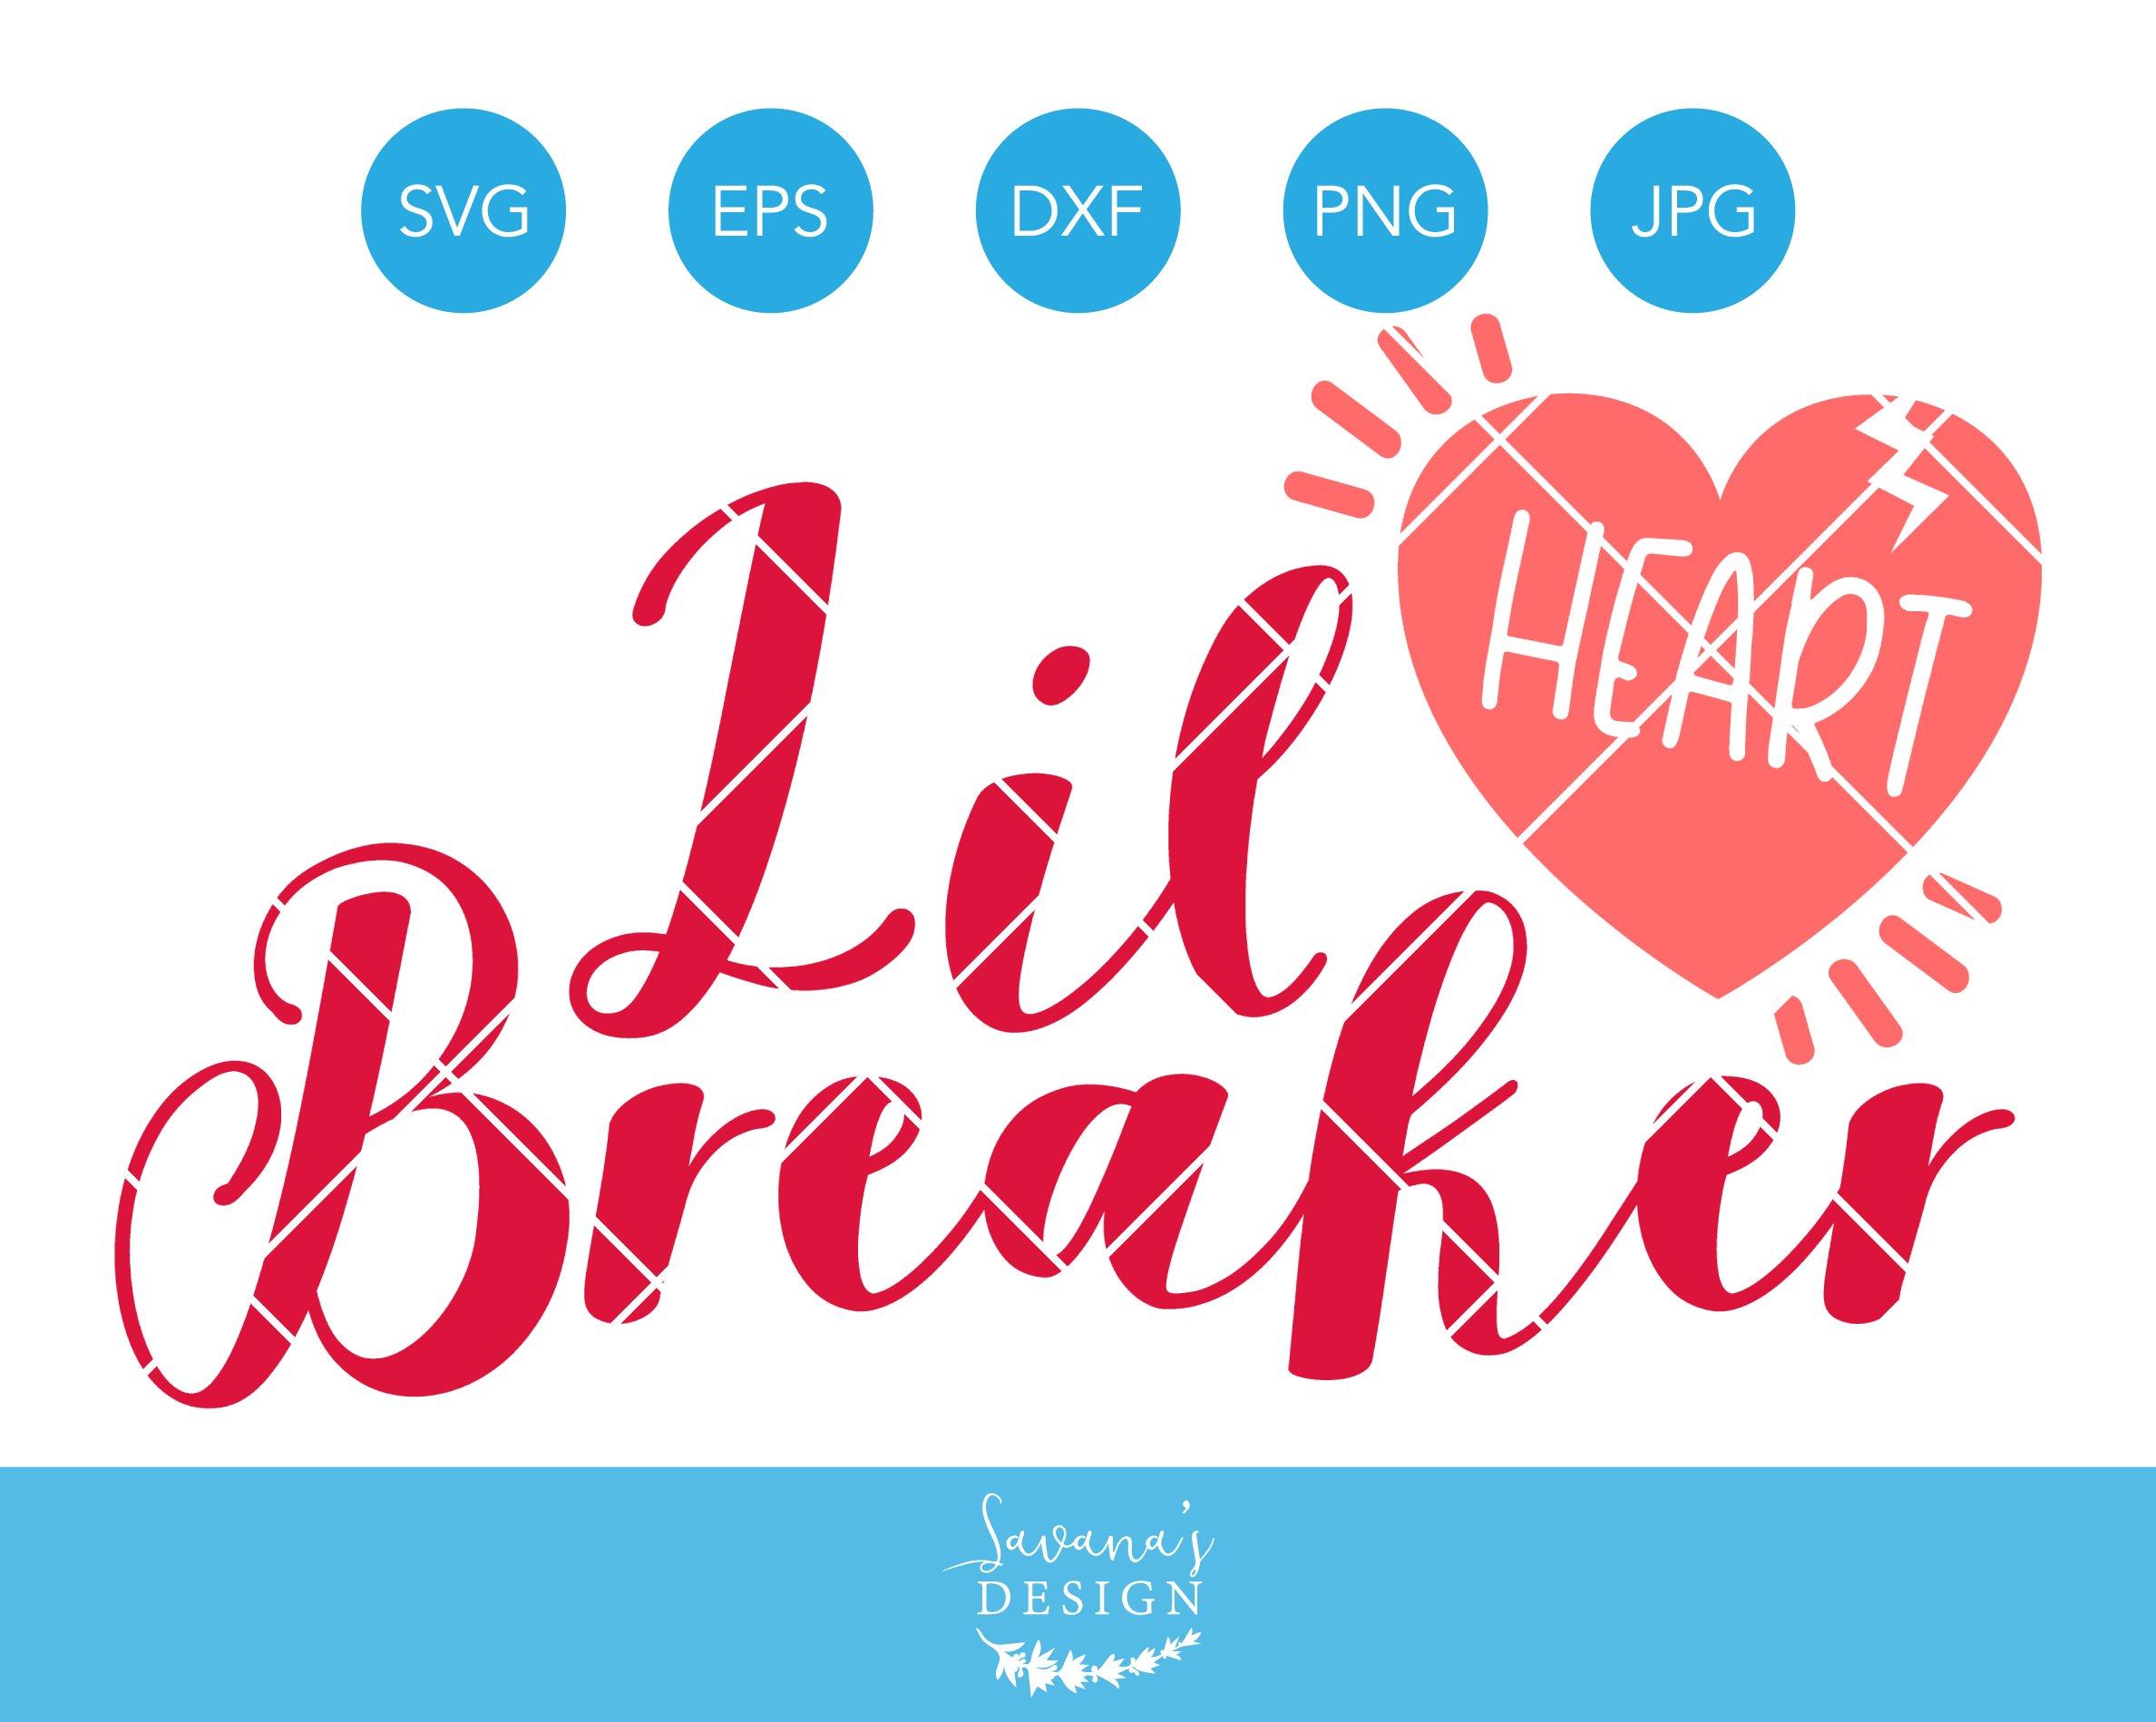 Little Heart Breaker Svg Cut File Pre Designed Illustrator Graphics Creative Market